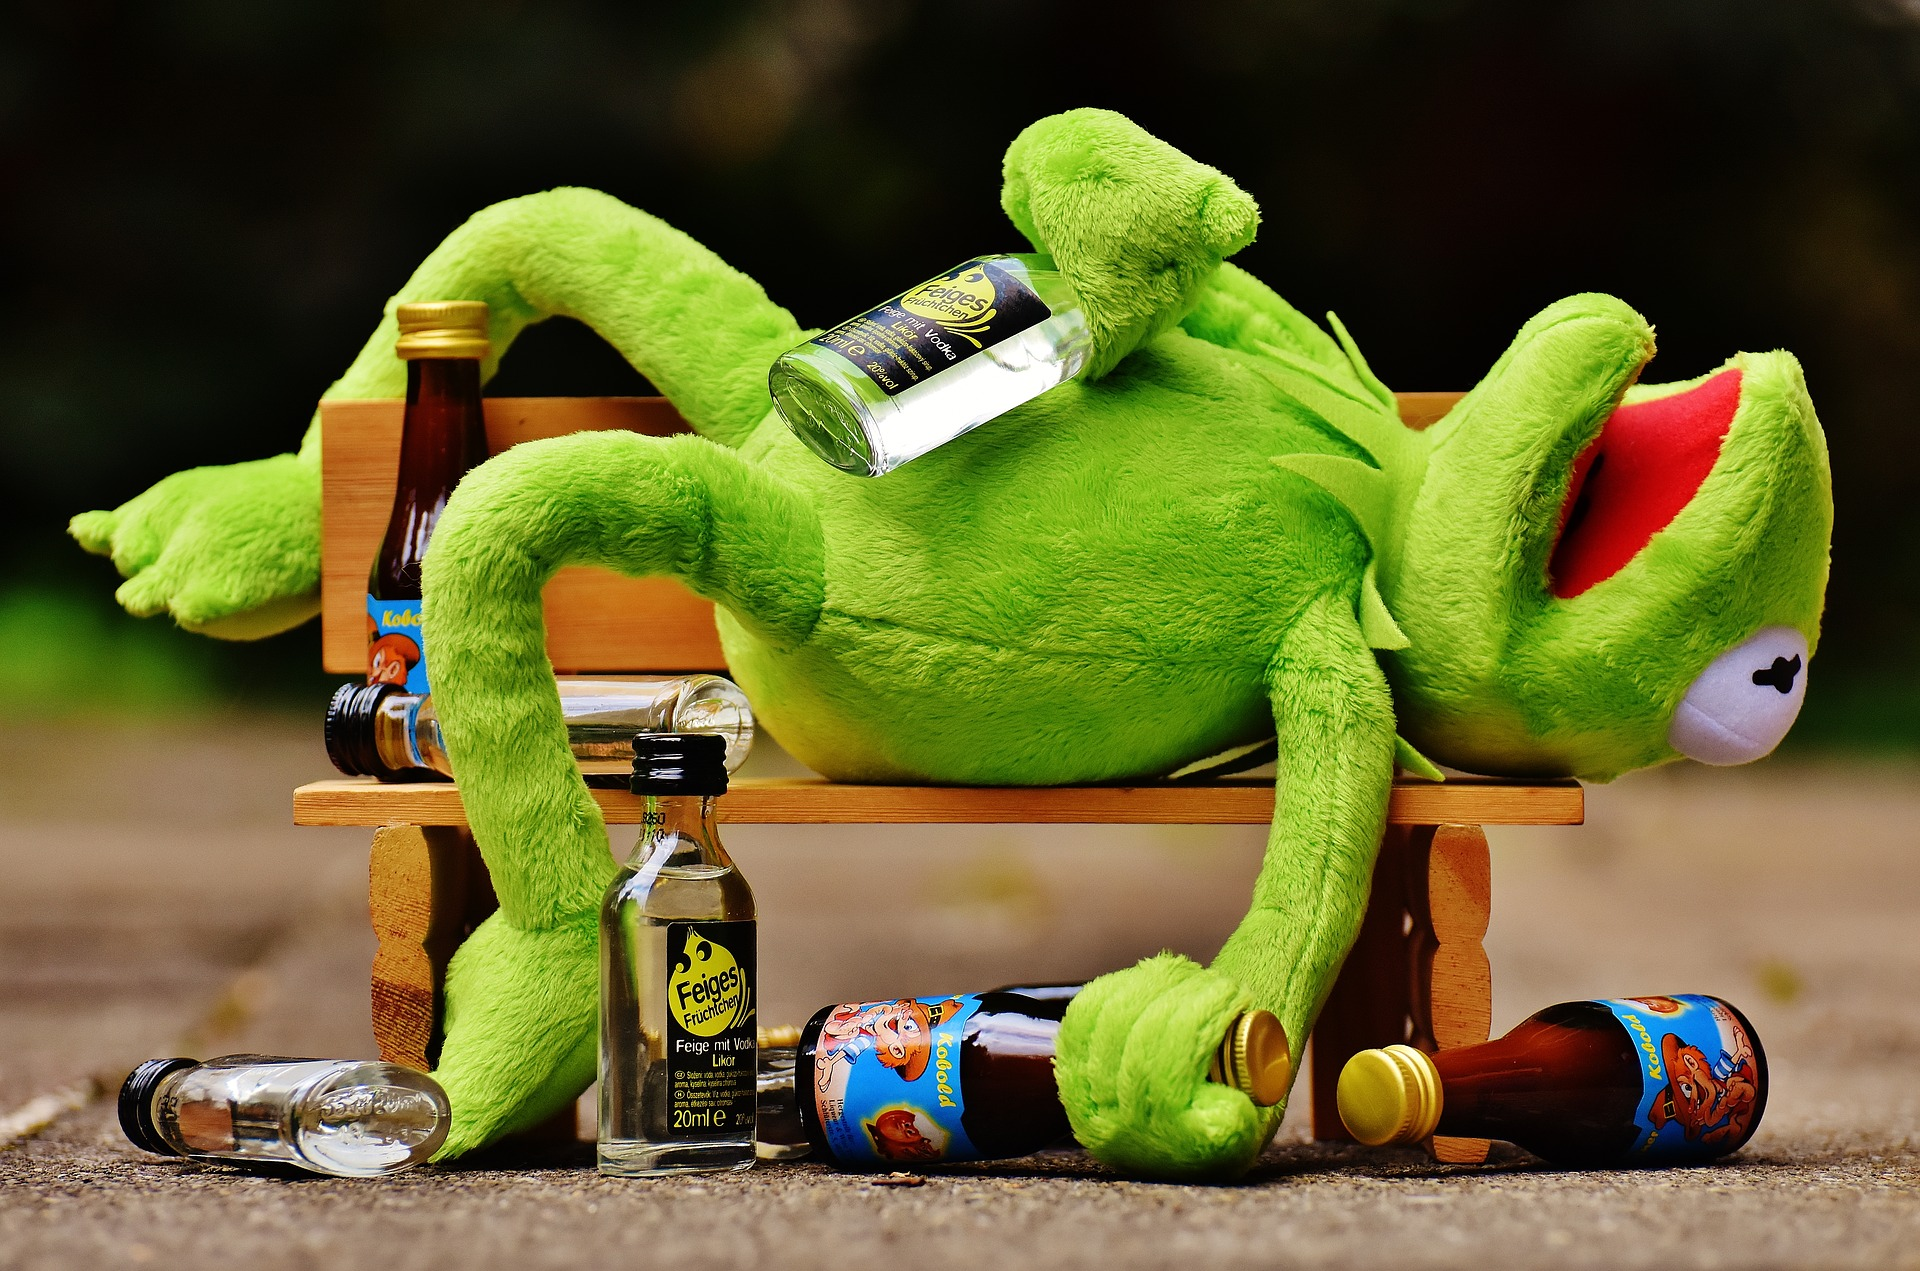 Žabac Kermit, pijani žabac